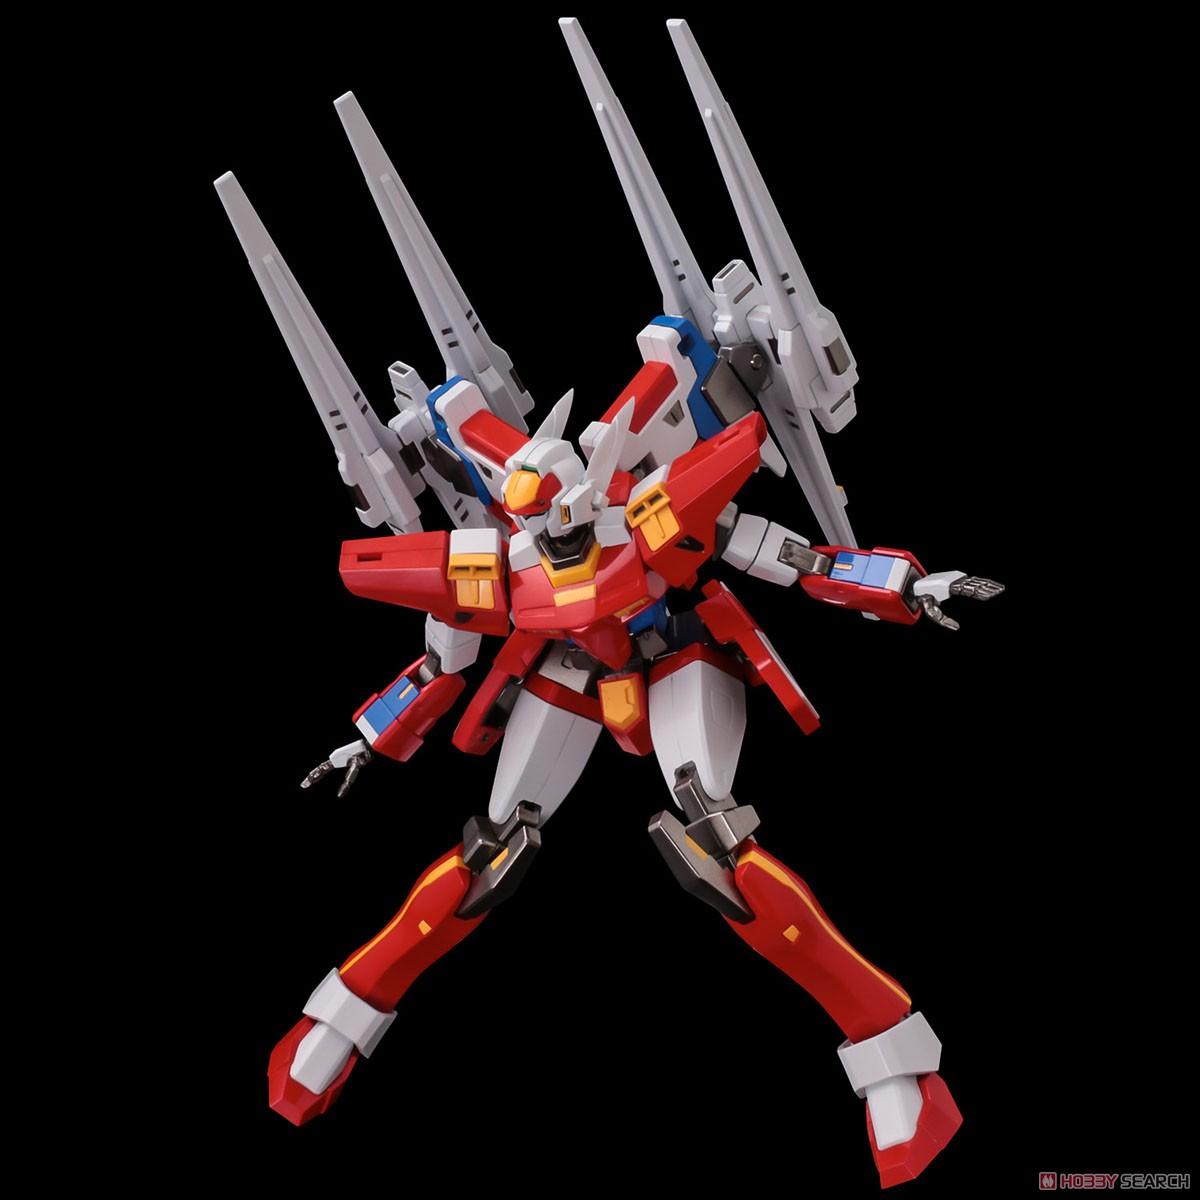 RIOBOT『変形合体 R-1』スーパーロボット大戦OG 可変合体フィギュア-035